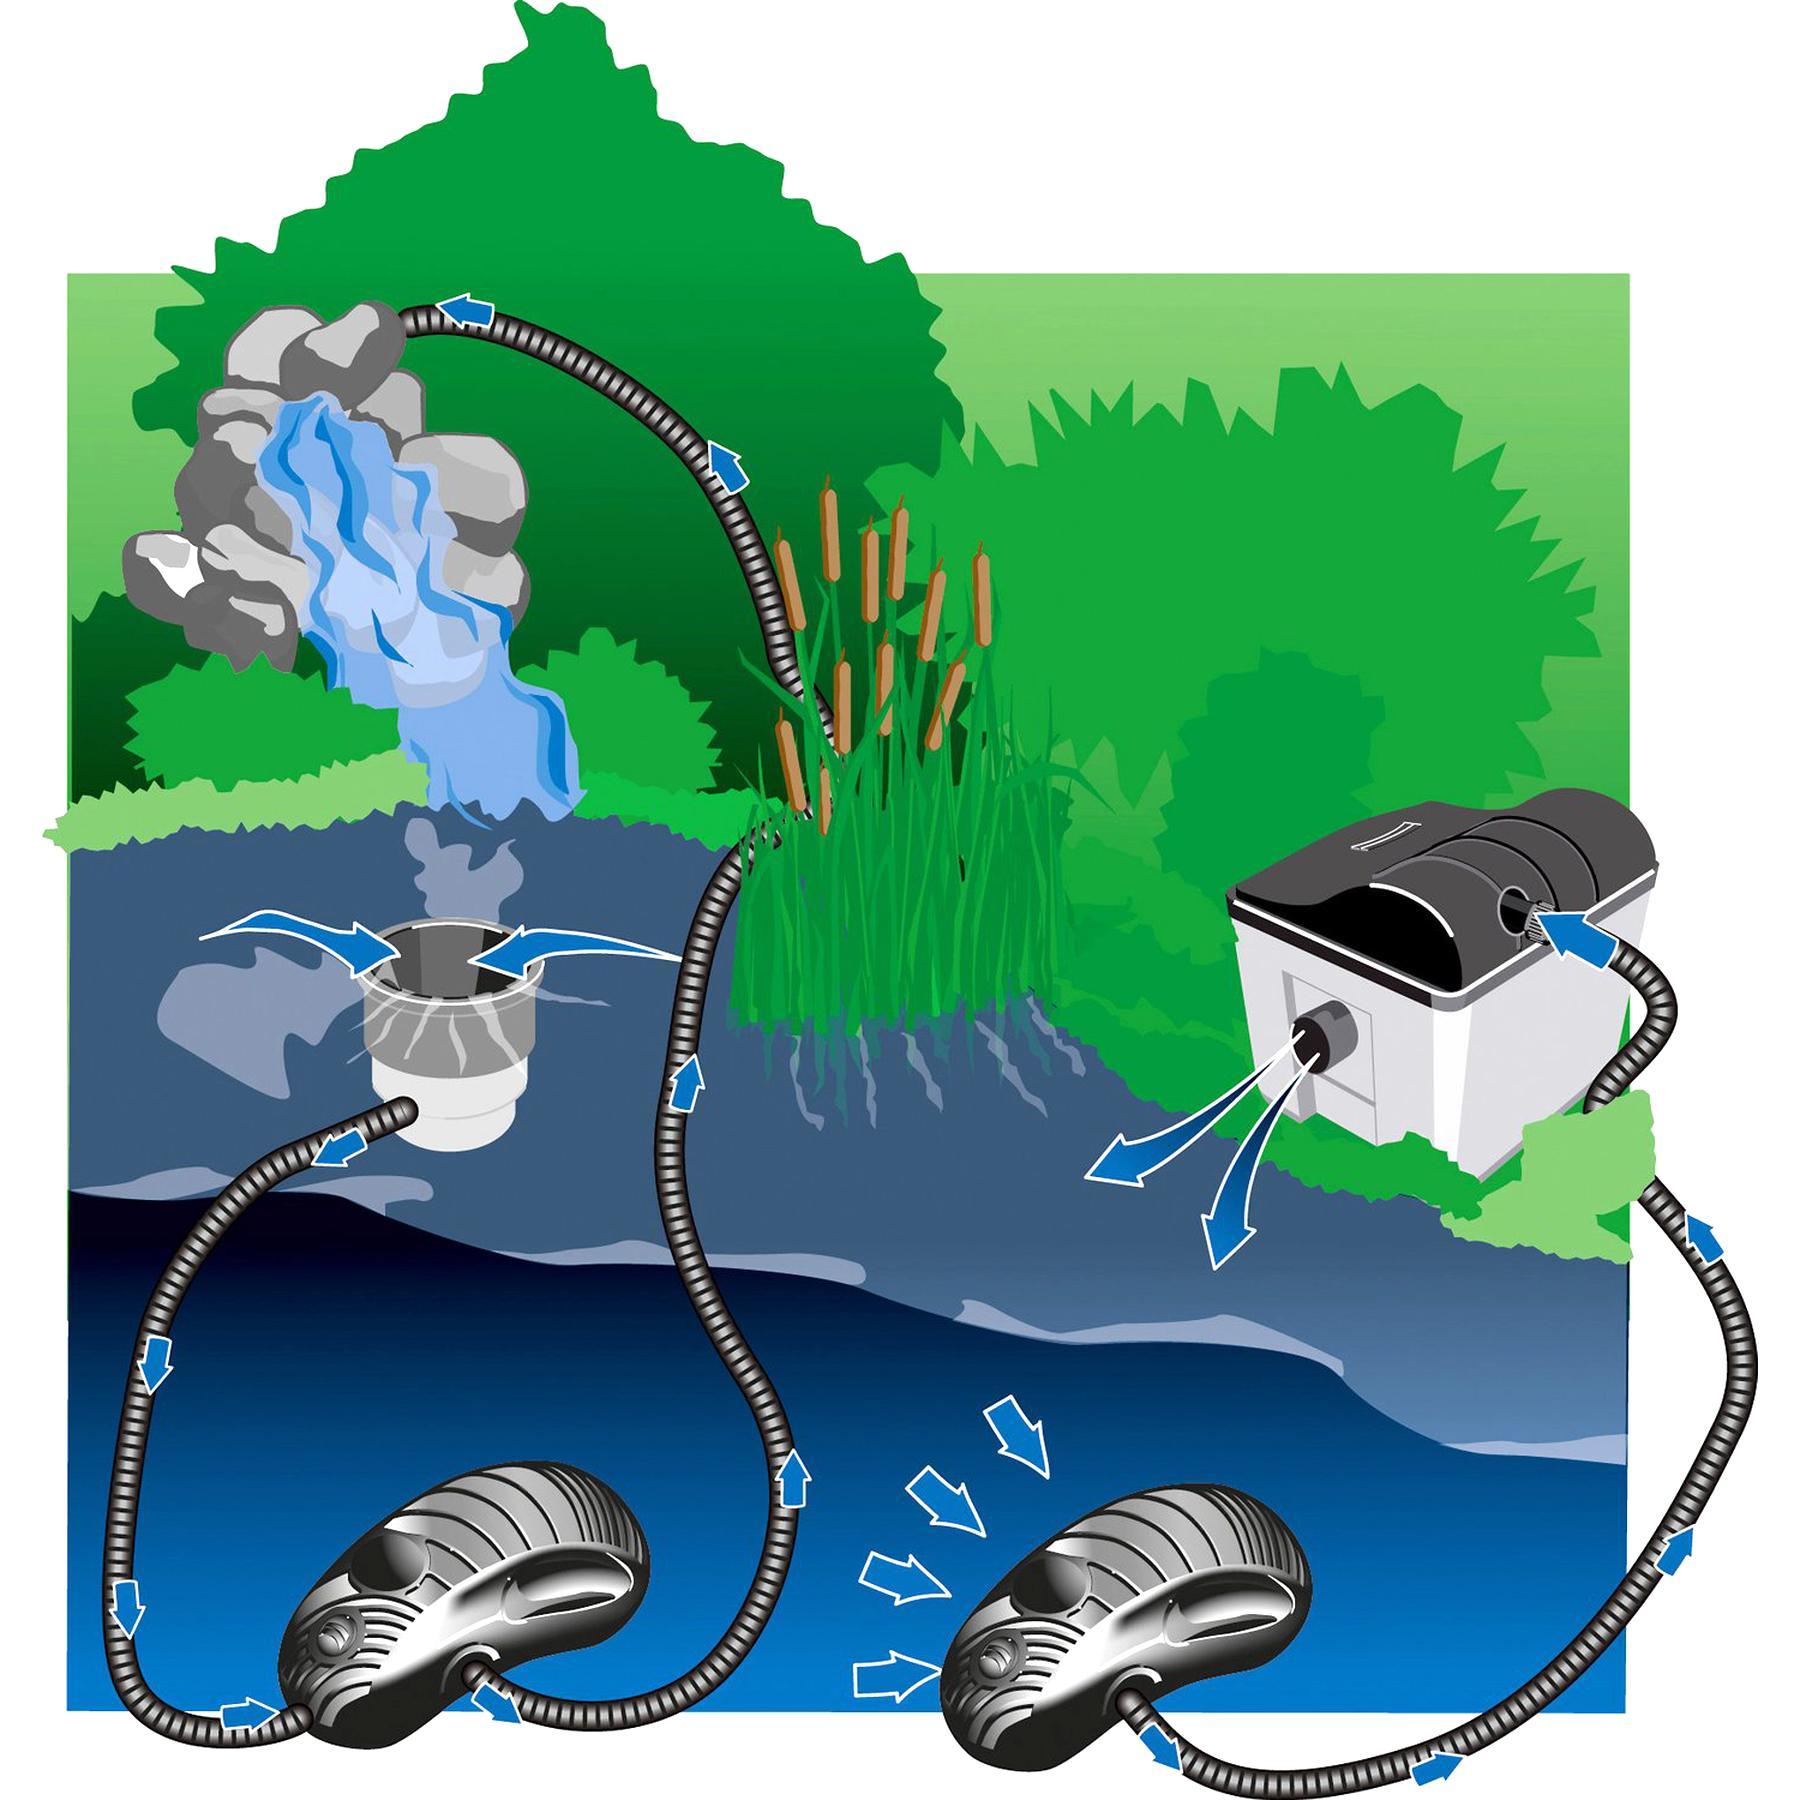 Teichpumpe Bachlaufpumpe Osaga 9500 Eco Pumpe Wasserpumpe Filterpumpe Teich